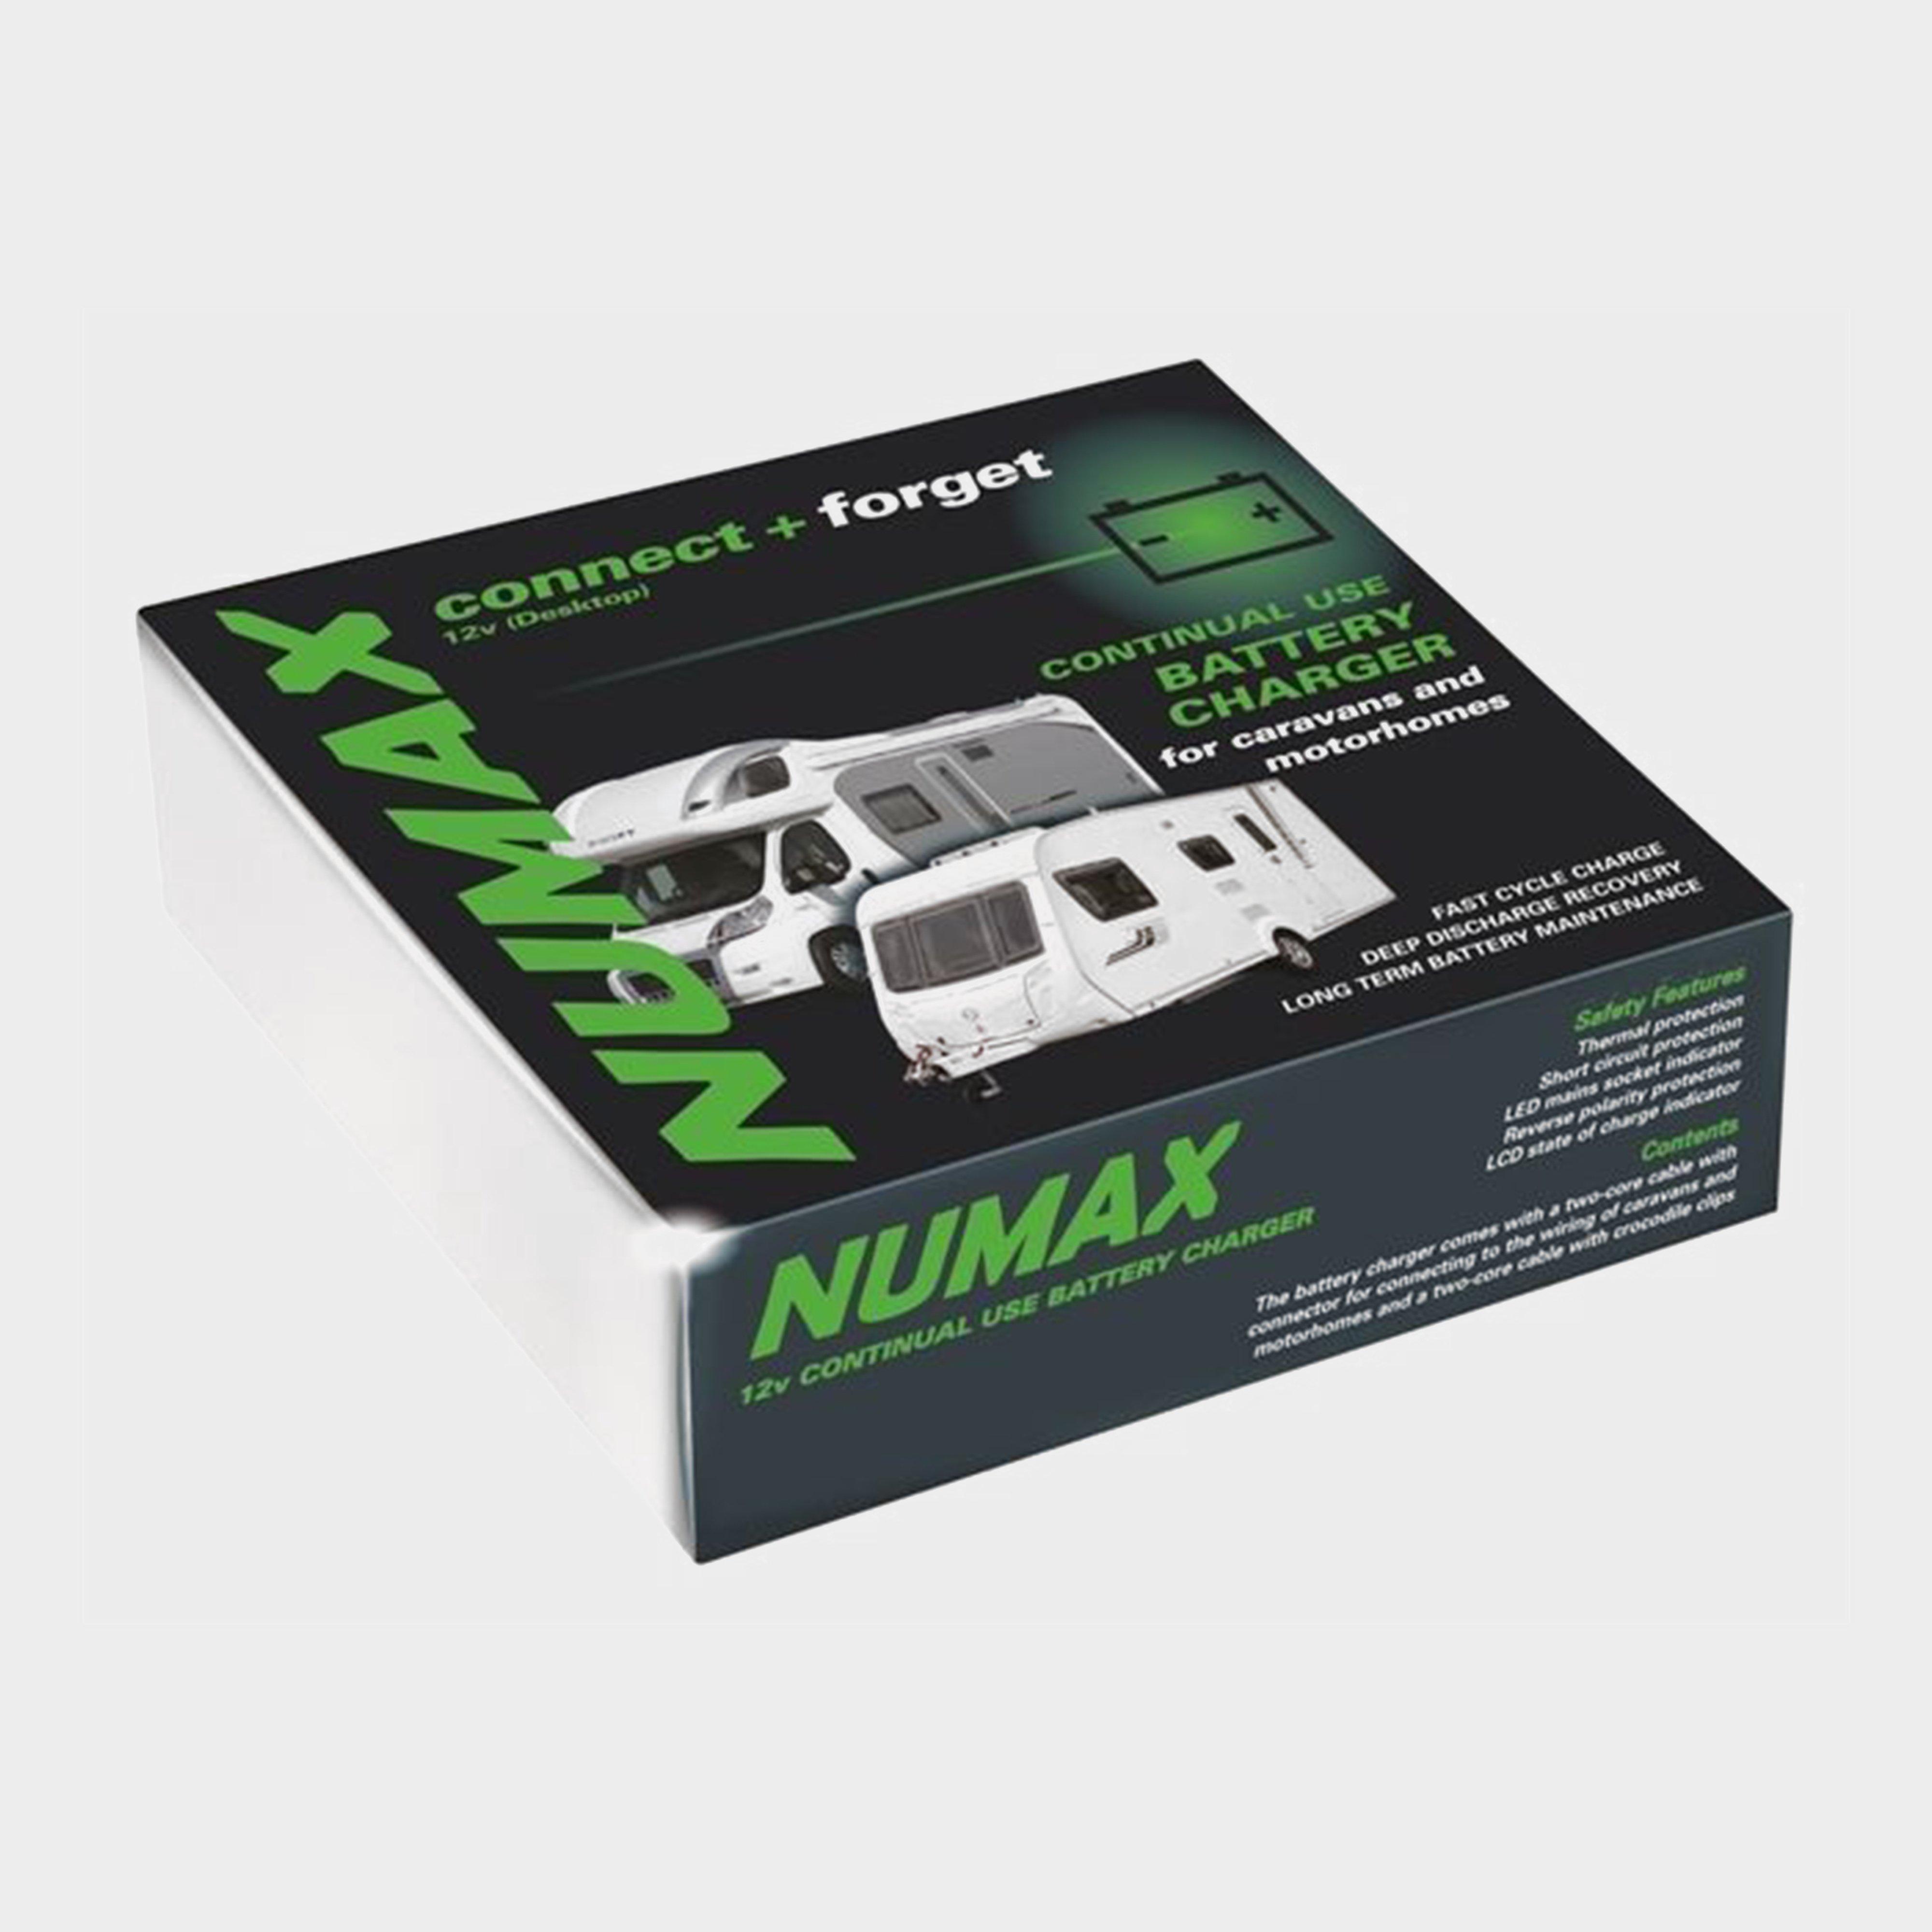 Numax 12 V 10A Leisure Battery Charger - Multi/Bur, Multi Coloured